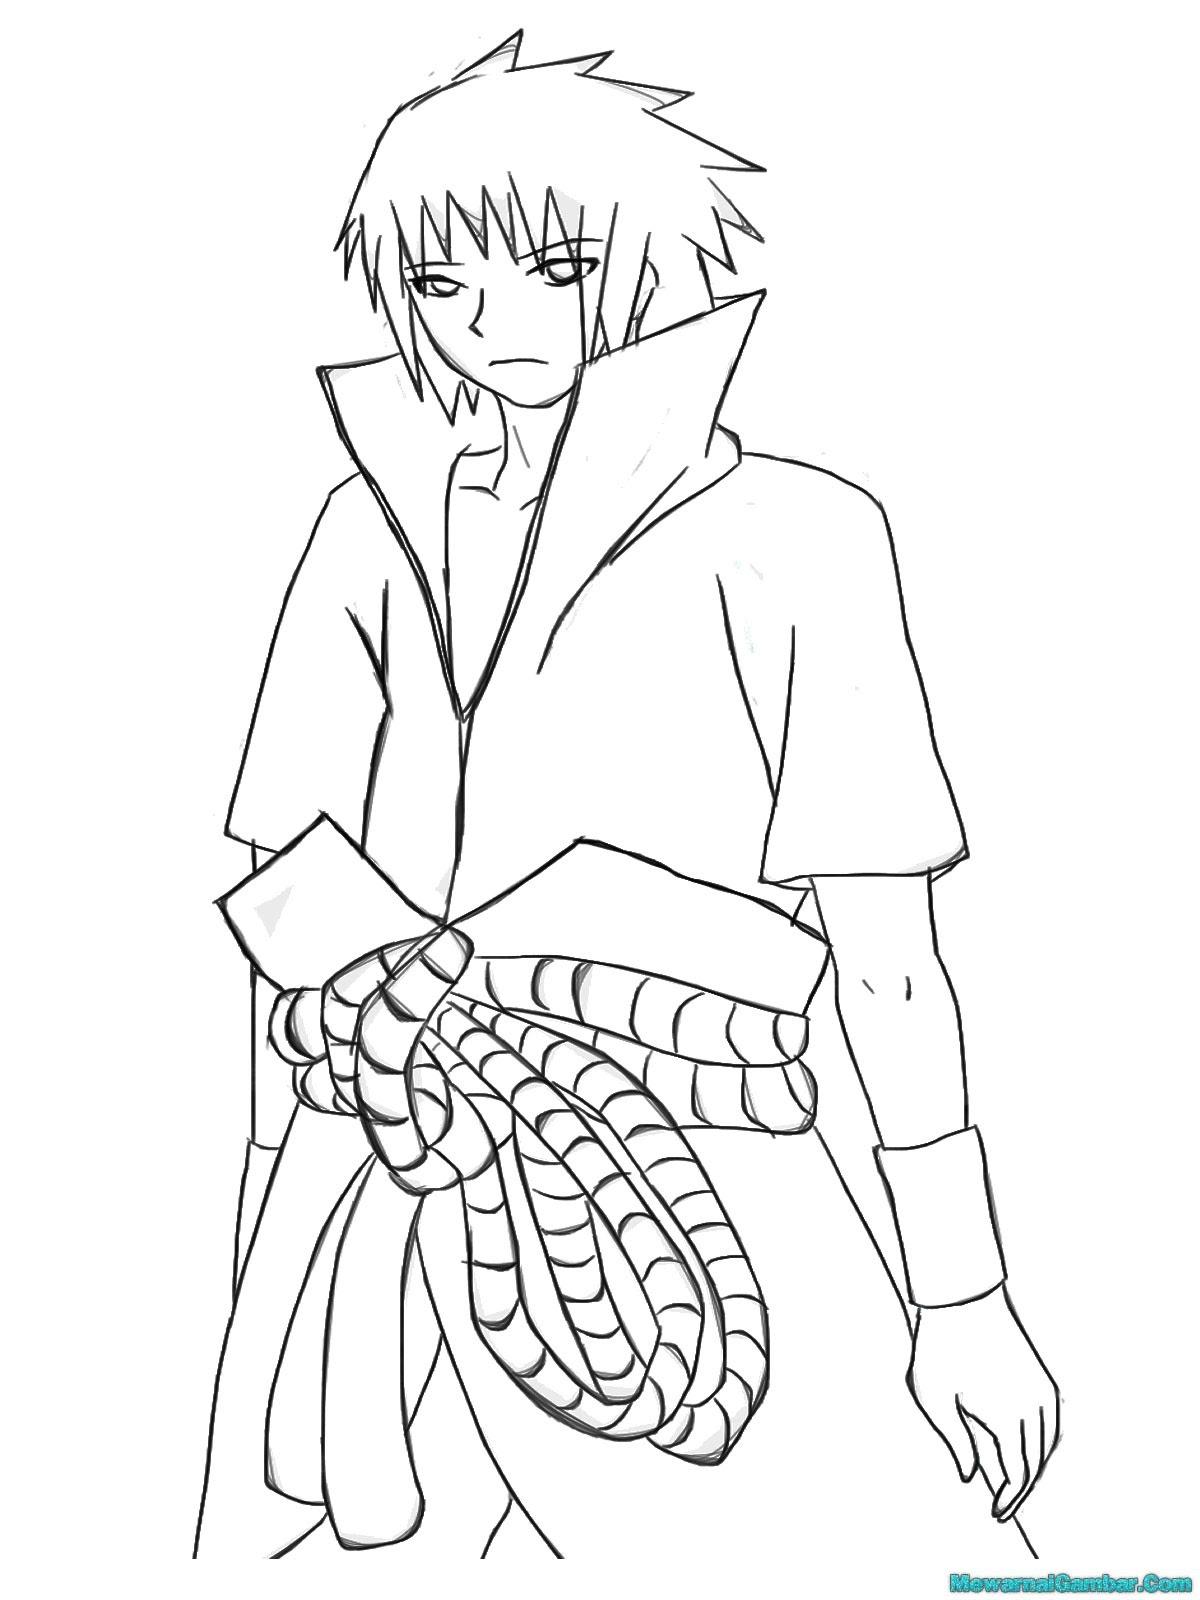 Koleksi Mewarnai Gambar Naruto Vs Sasuke